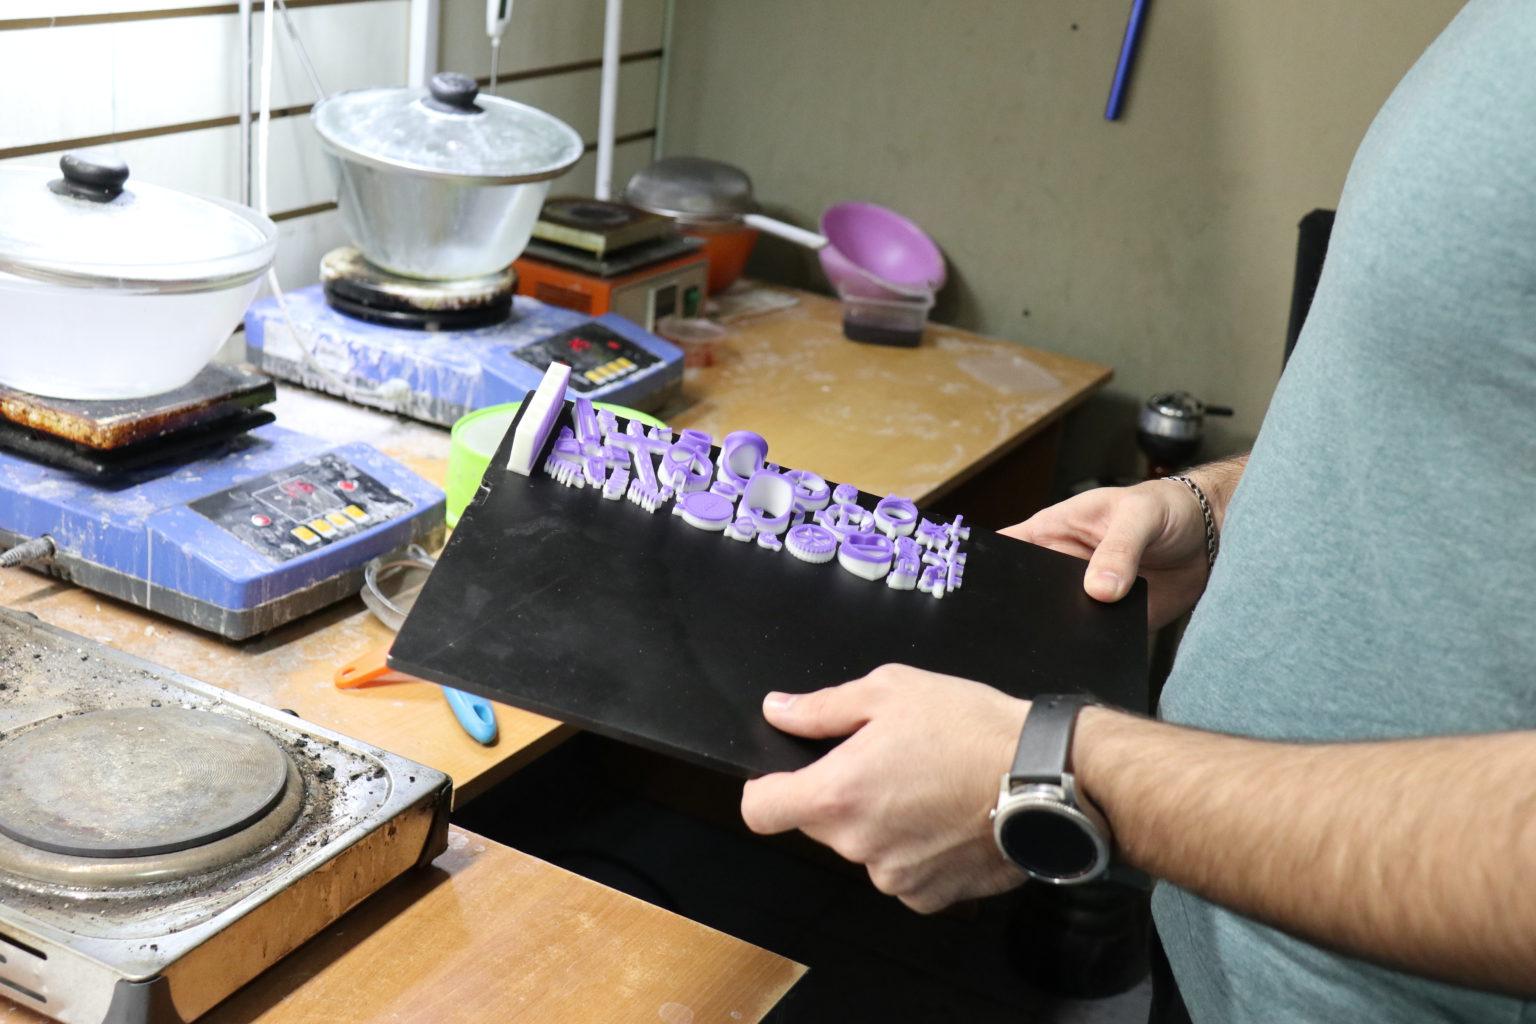 IMG 1420 1536x1024 - 3D печать на projet 2500